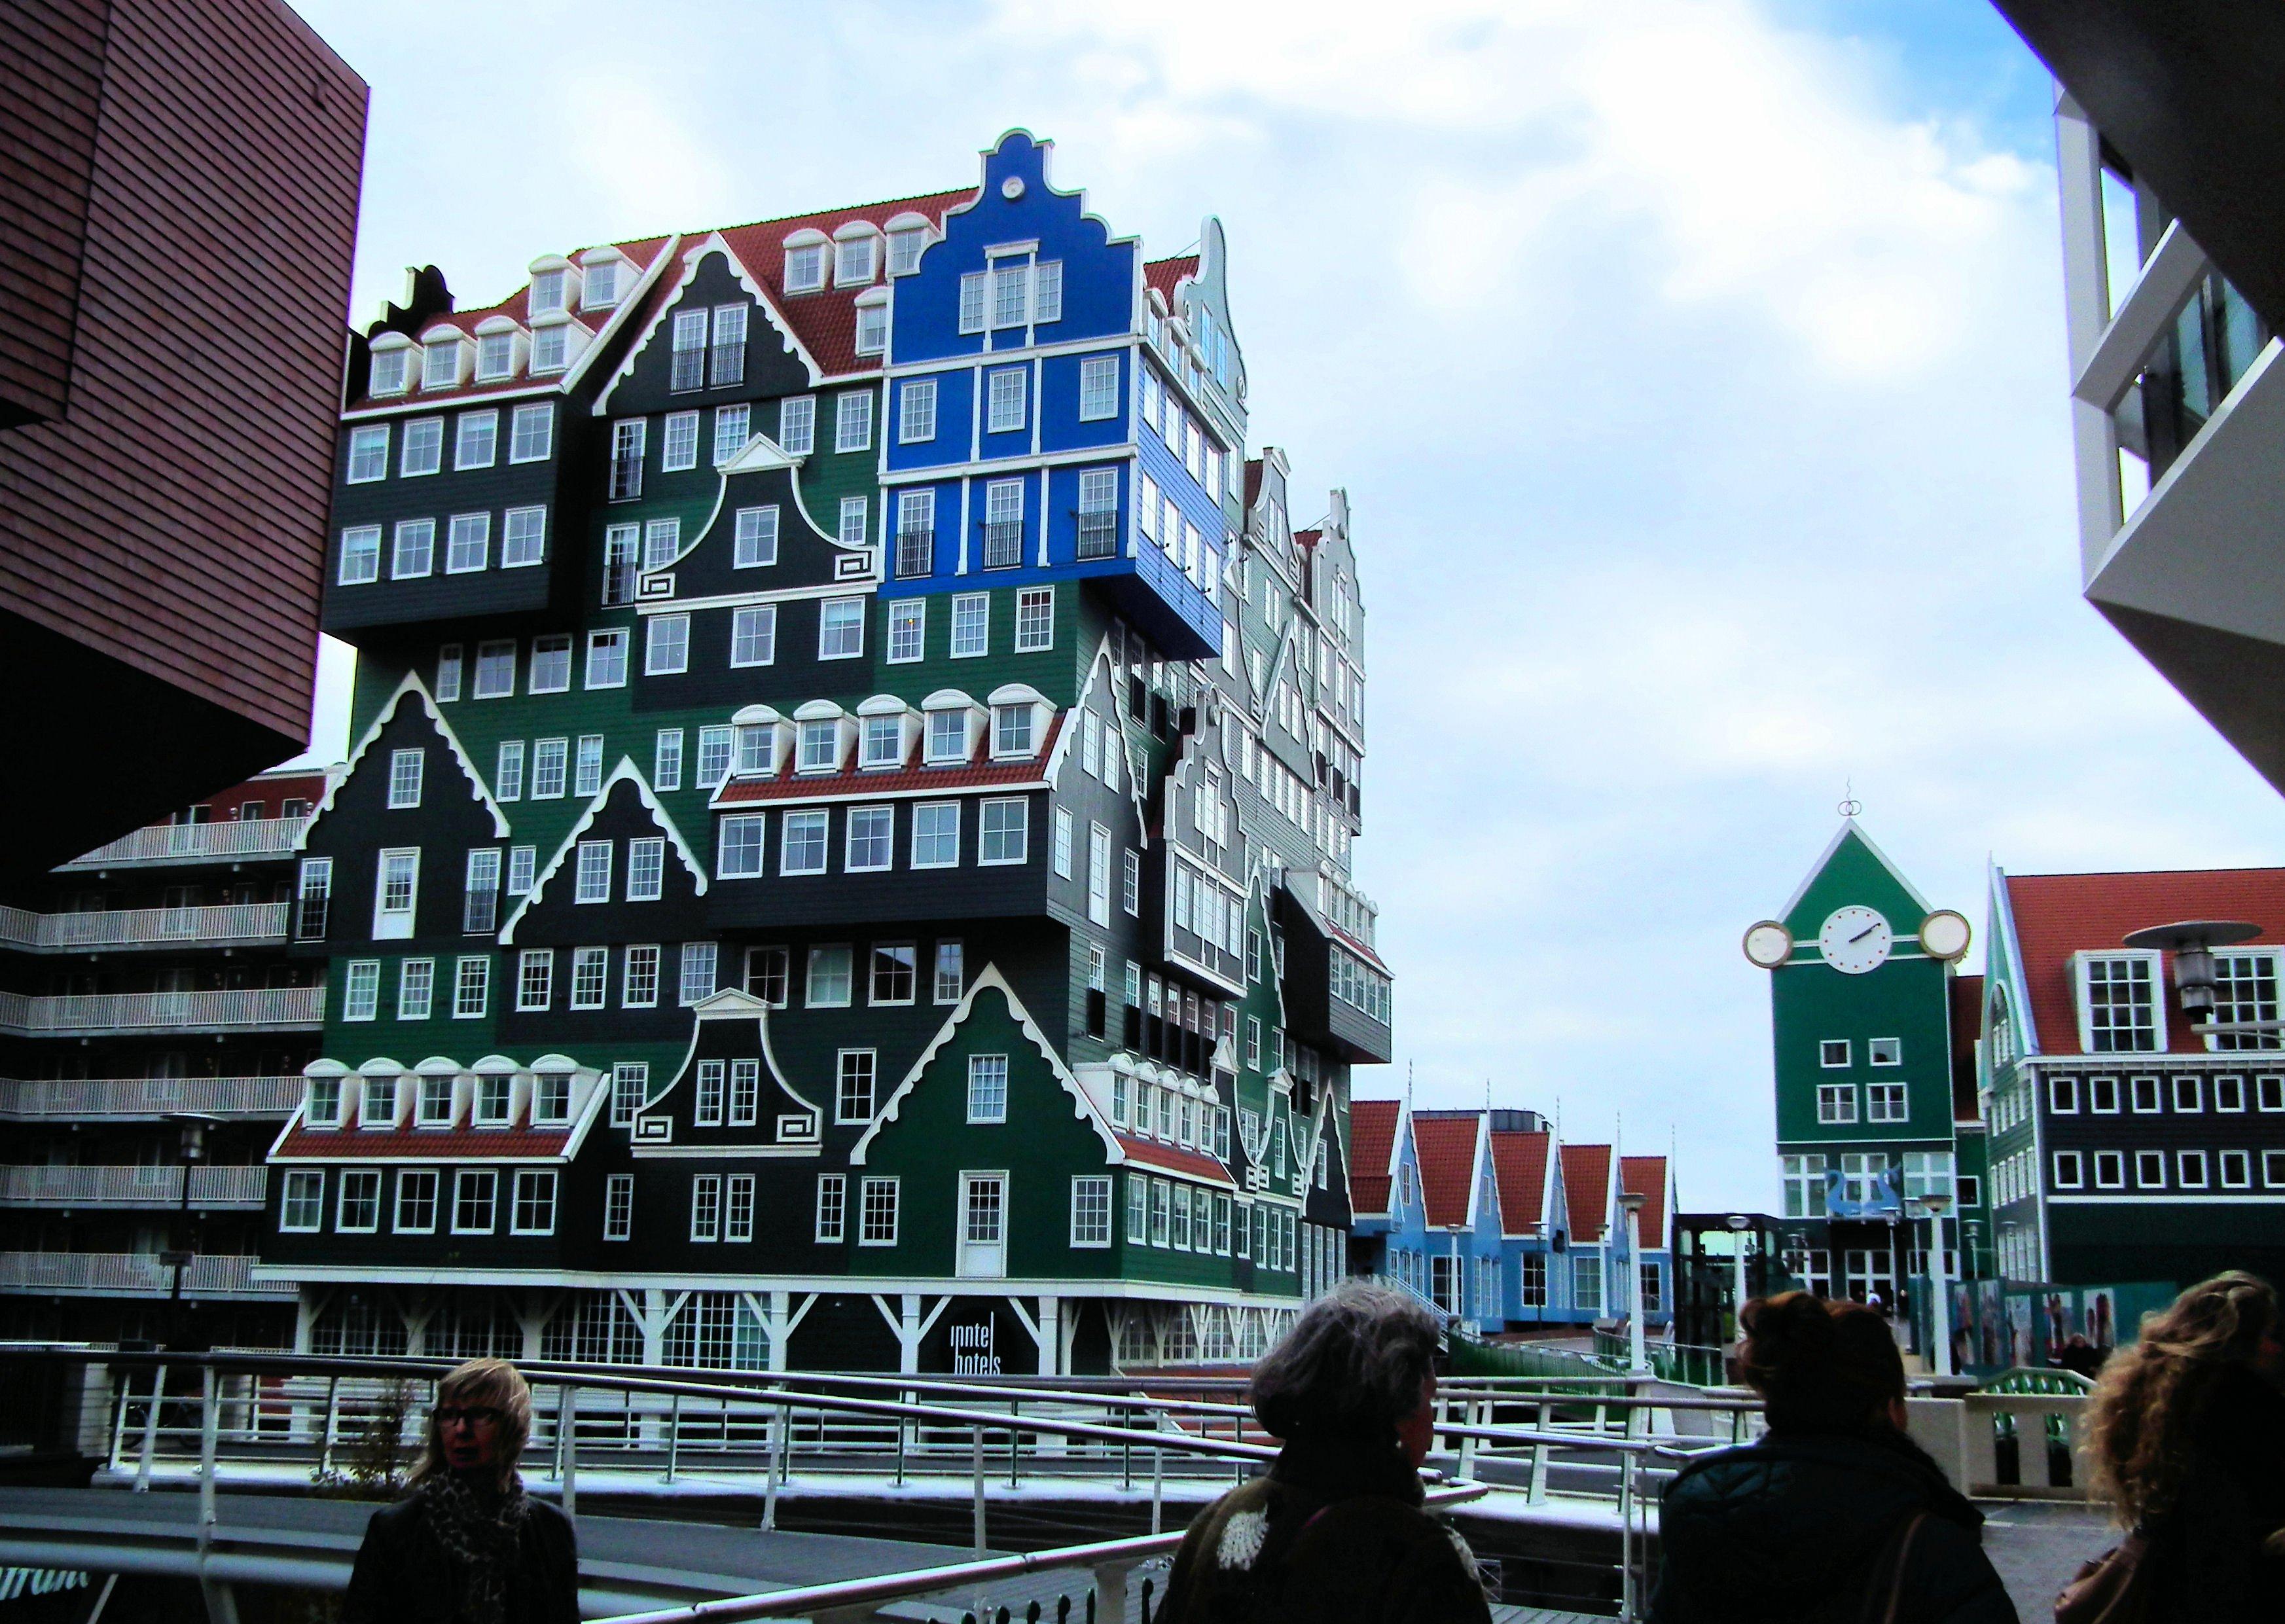 Winkelen in de Zaanstreek   ZaanportaalZaanpor